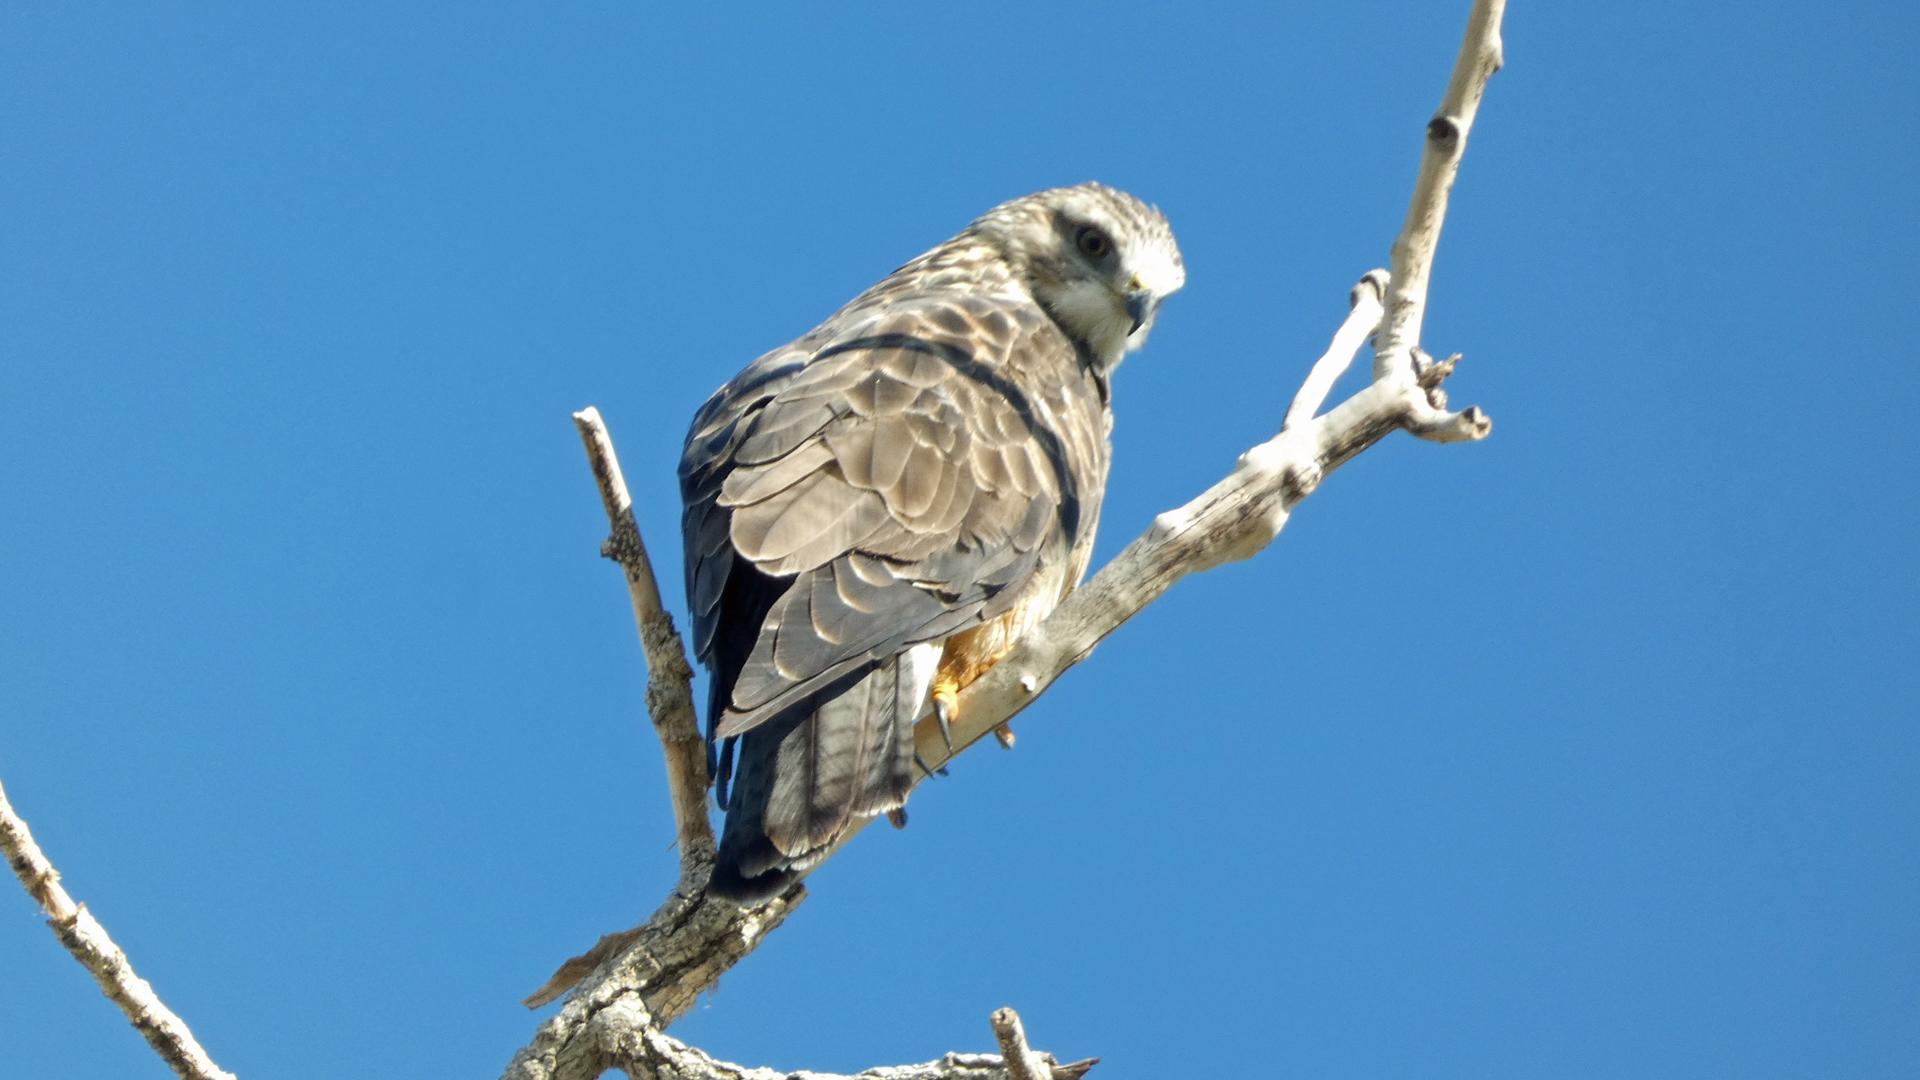 Immature, Rio Grande Bosque, Albuquerque, September 2021